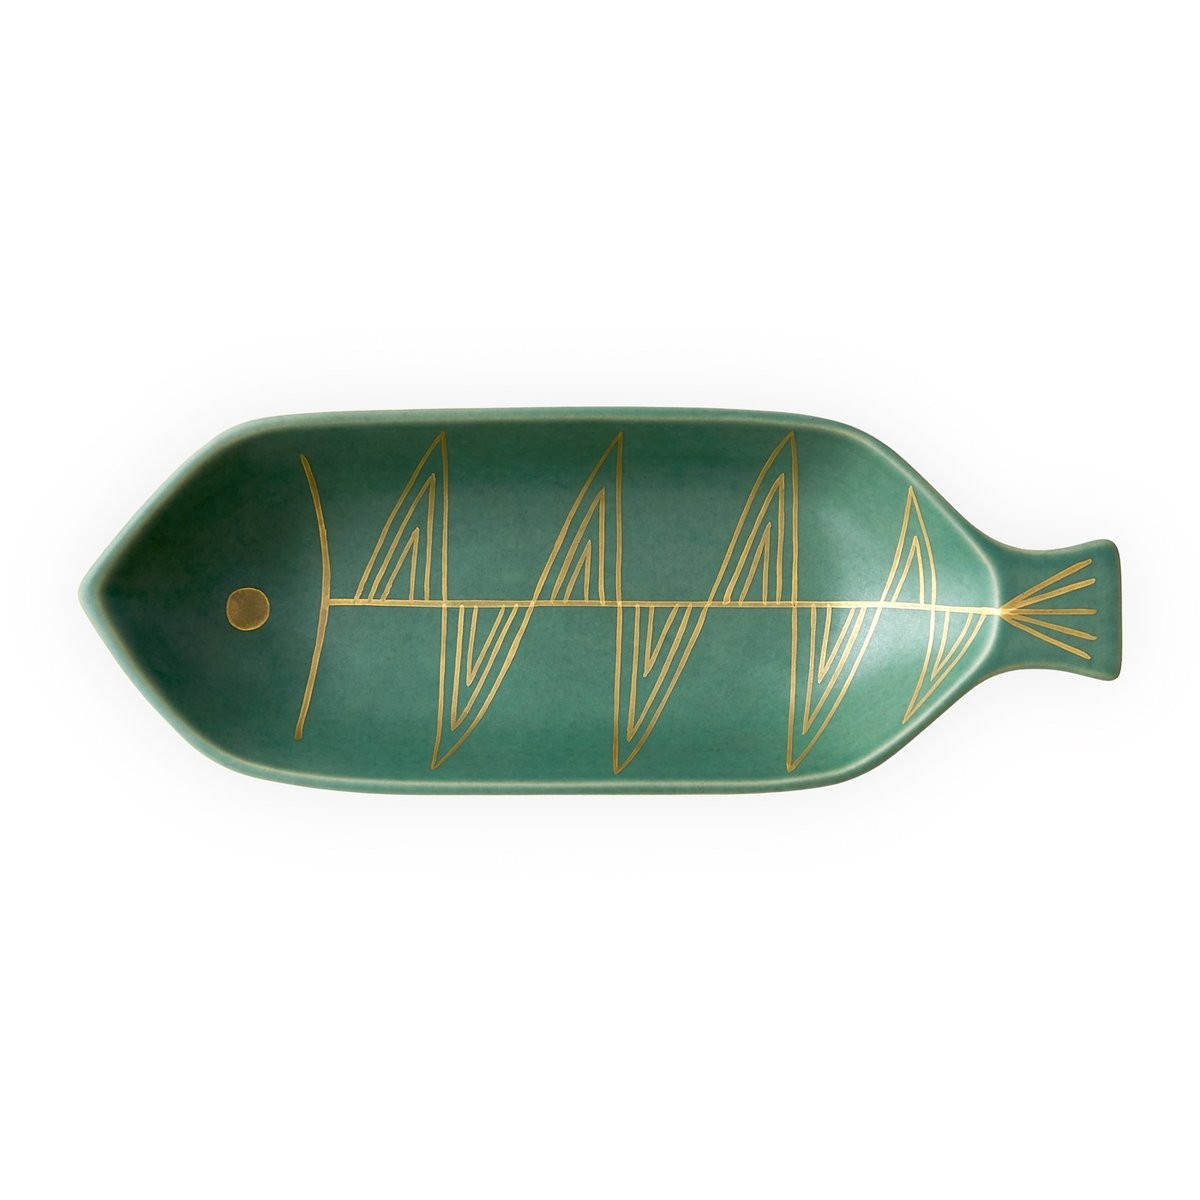 Jonathan Adler I Small Amalfi Fish Dish